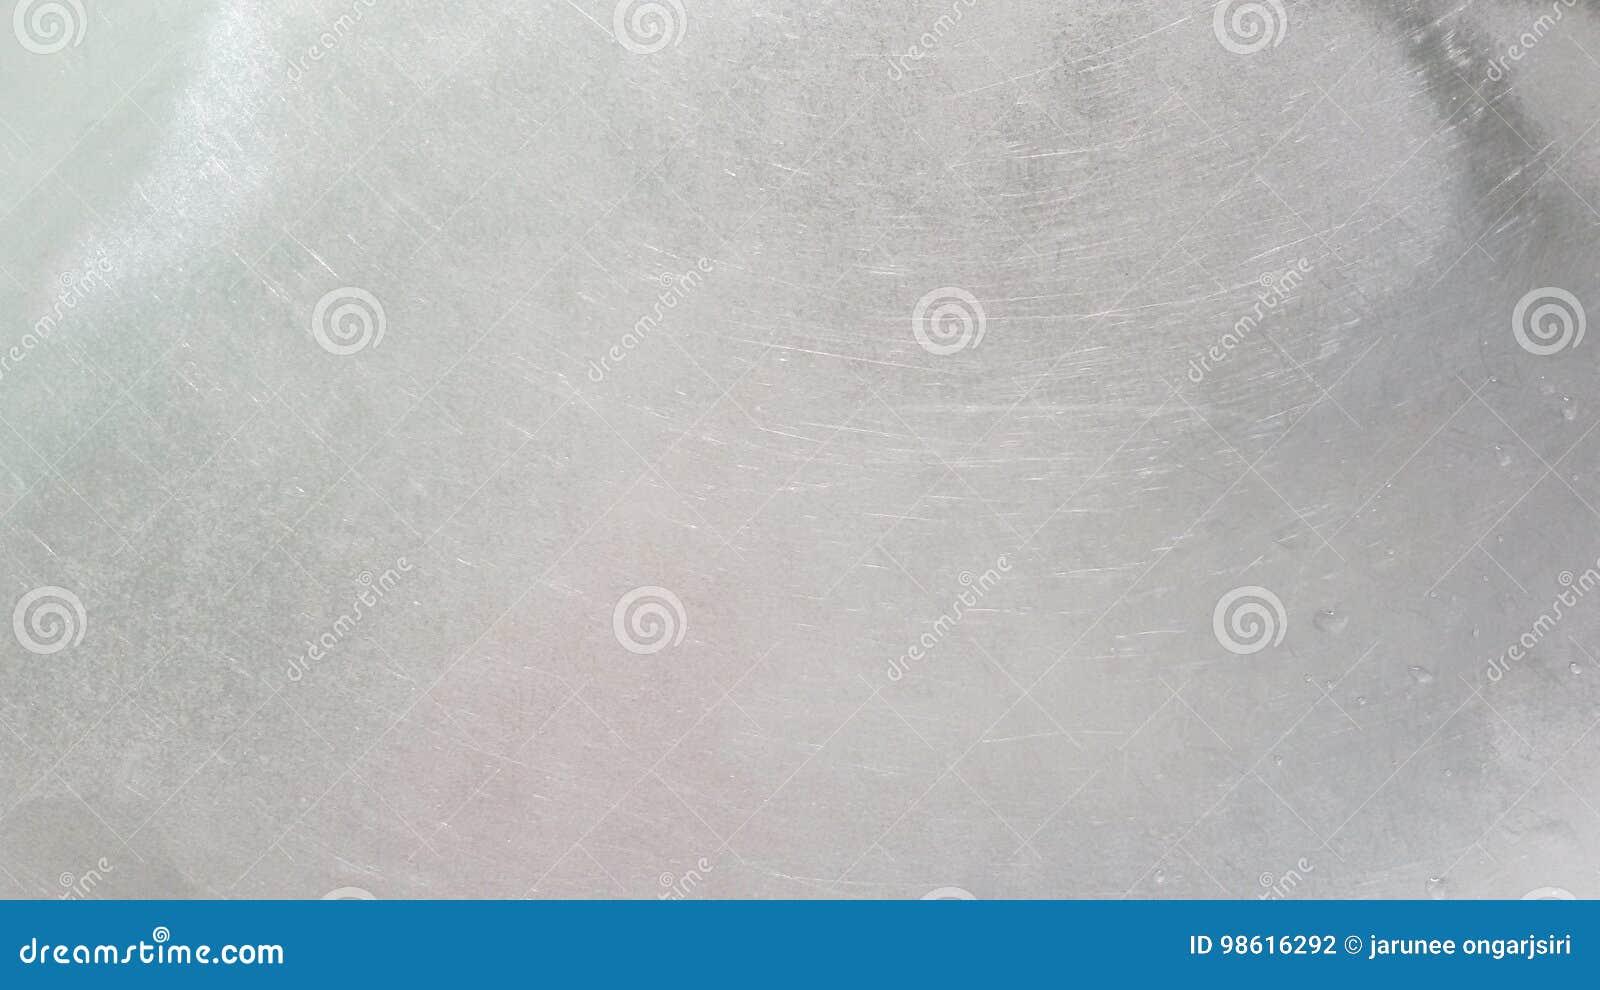 Silver grey abstract